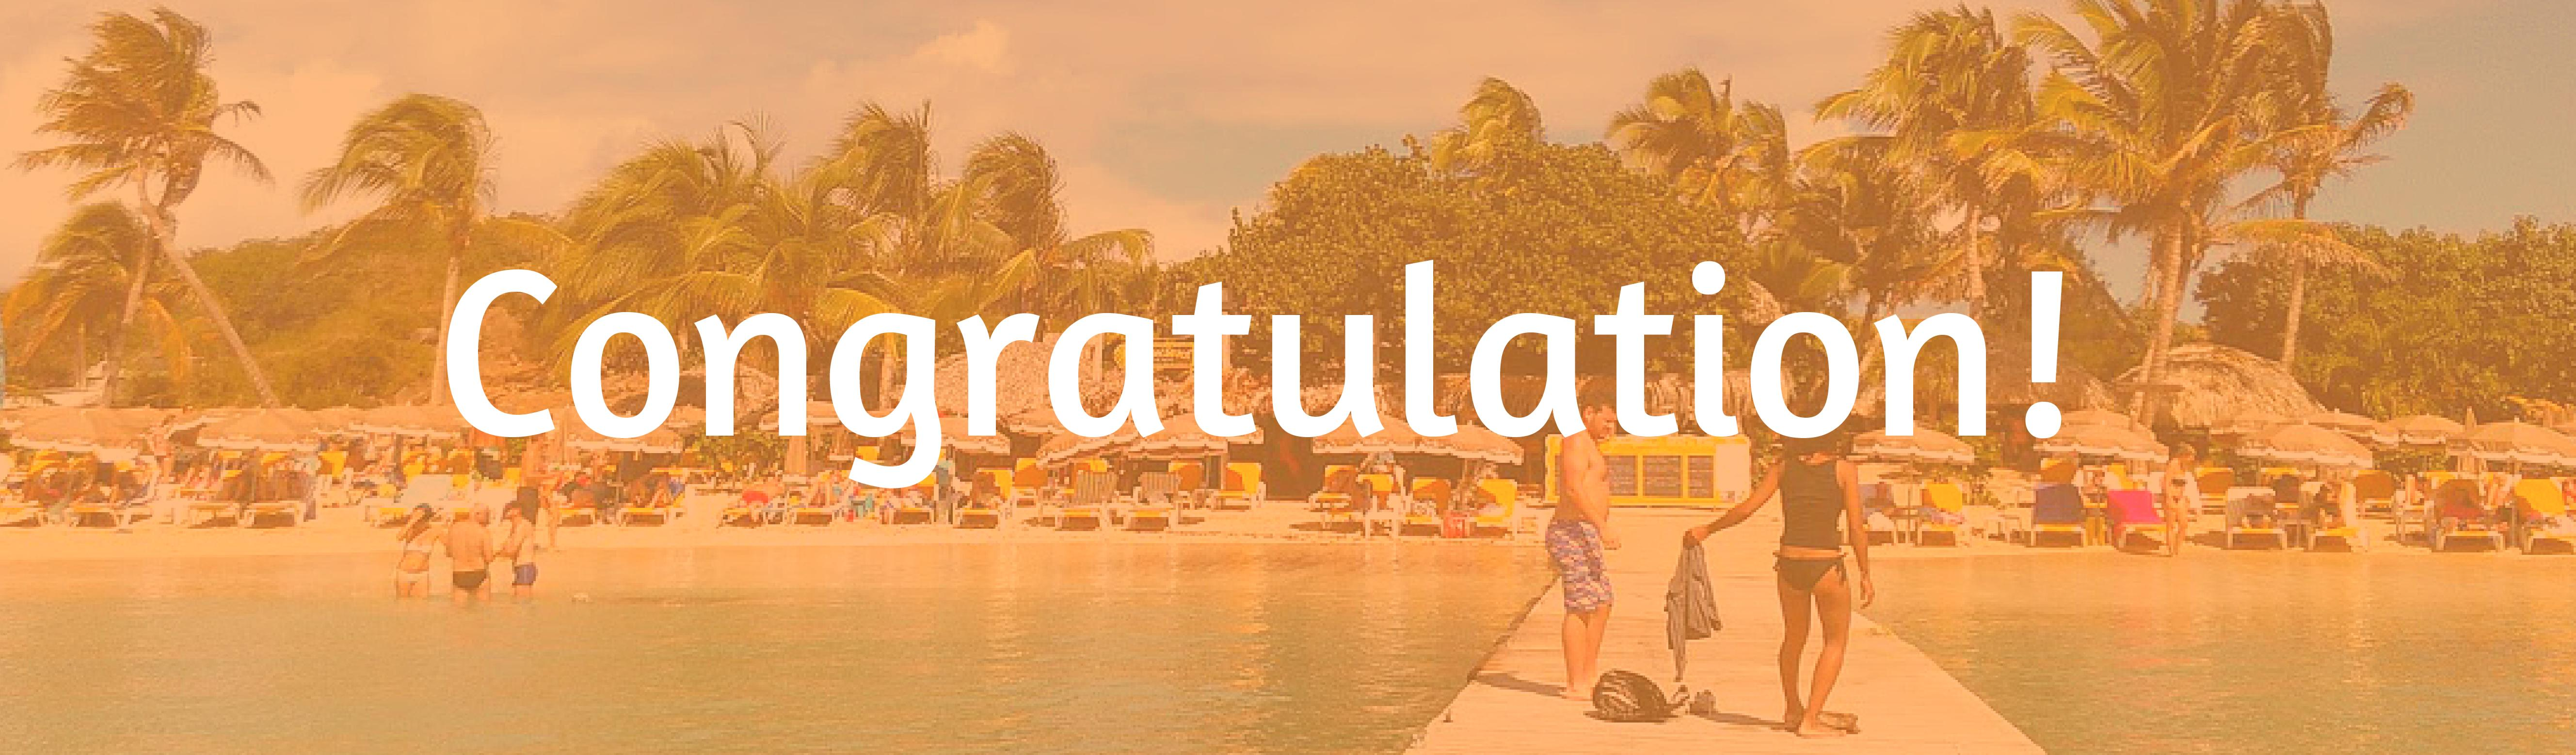 congratulation-sxm